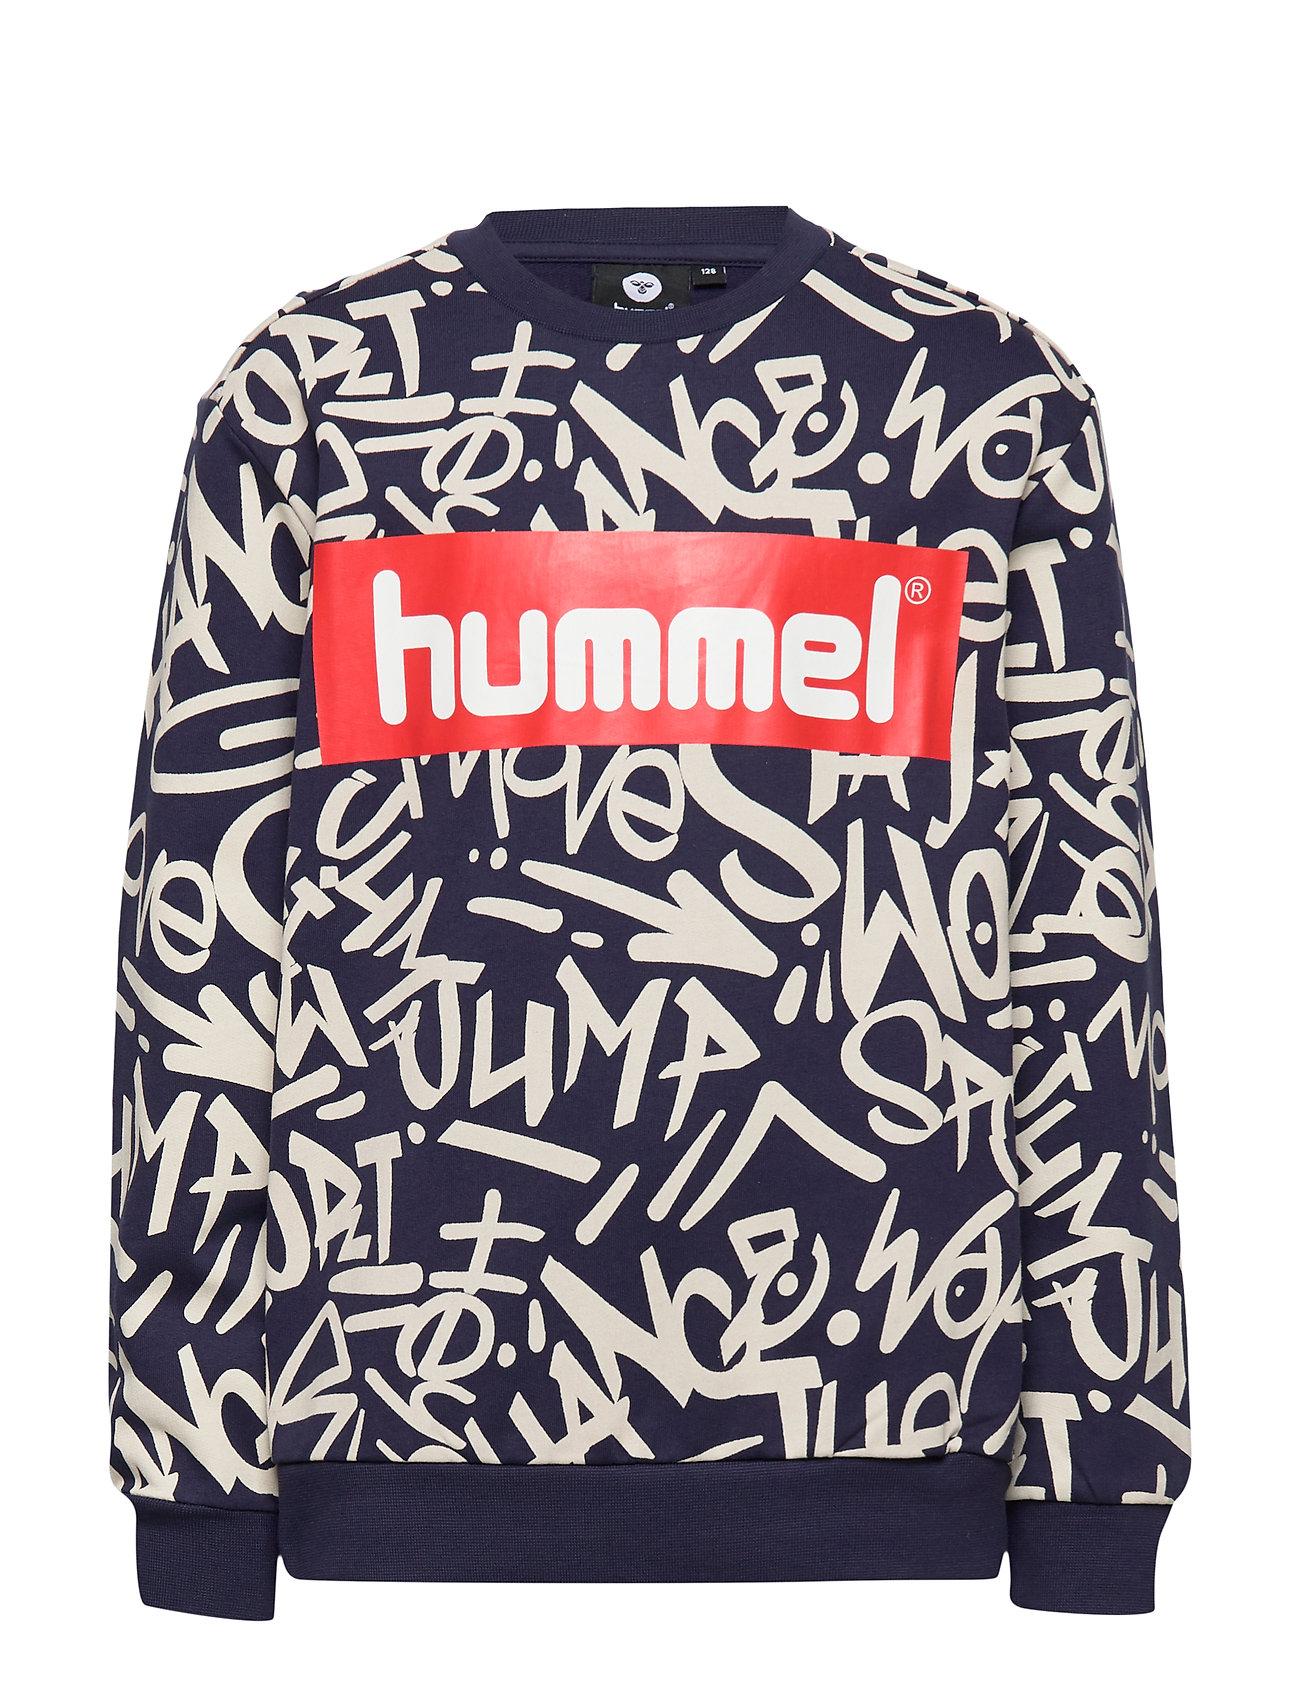 Hummel hmlEDMUND SWEATSHIRT - BLACK IRIS